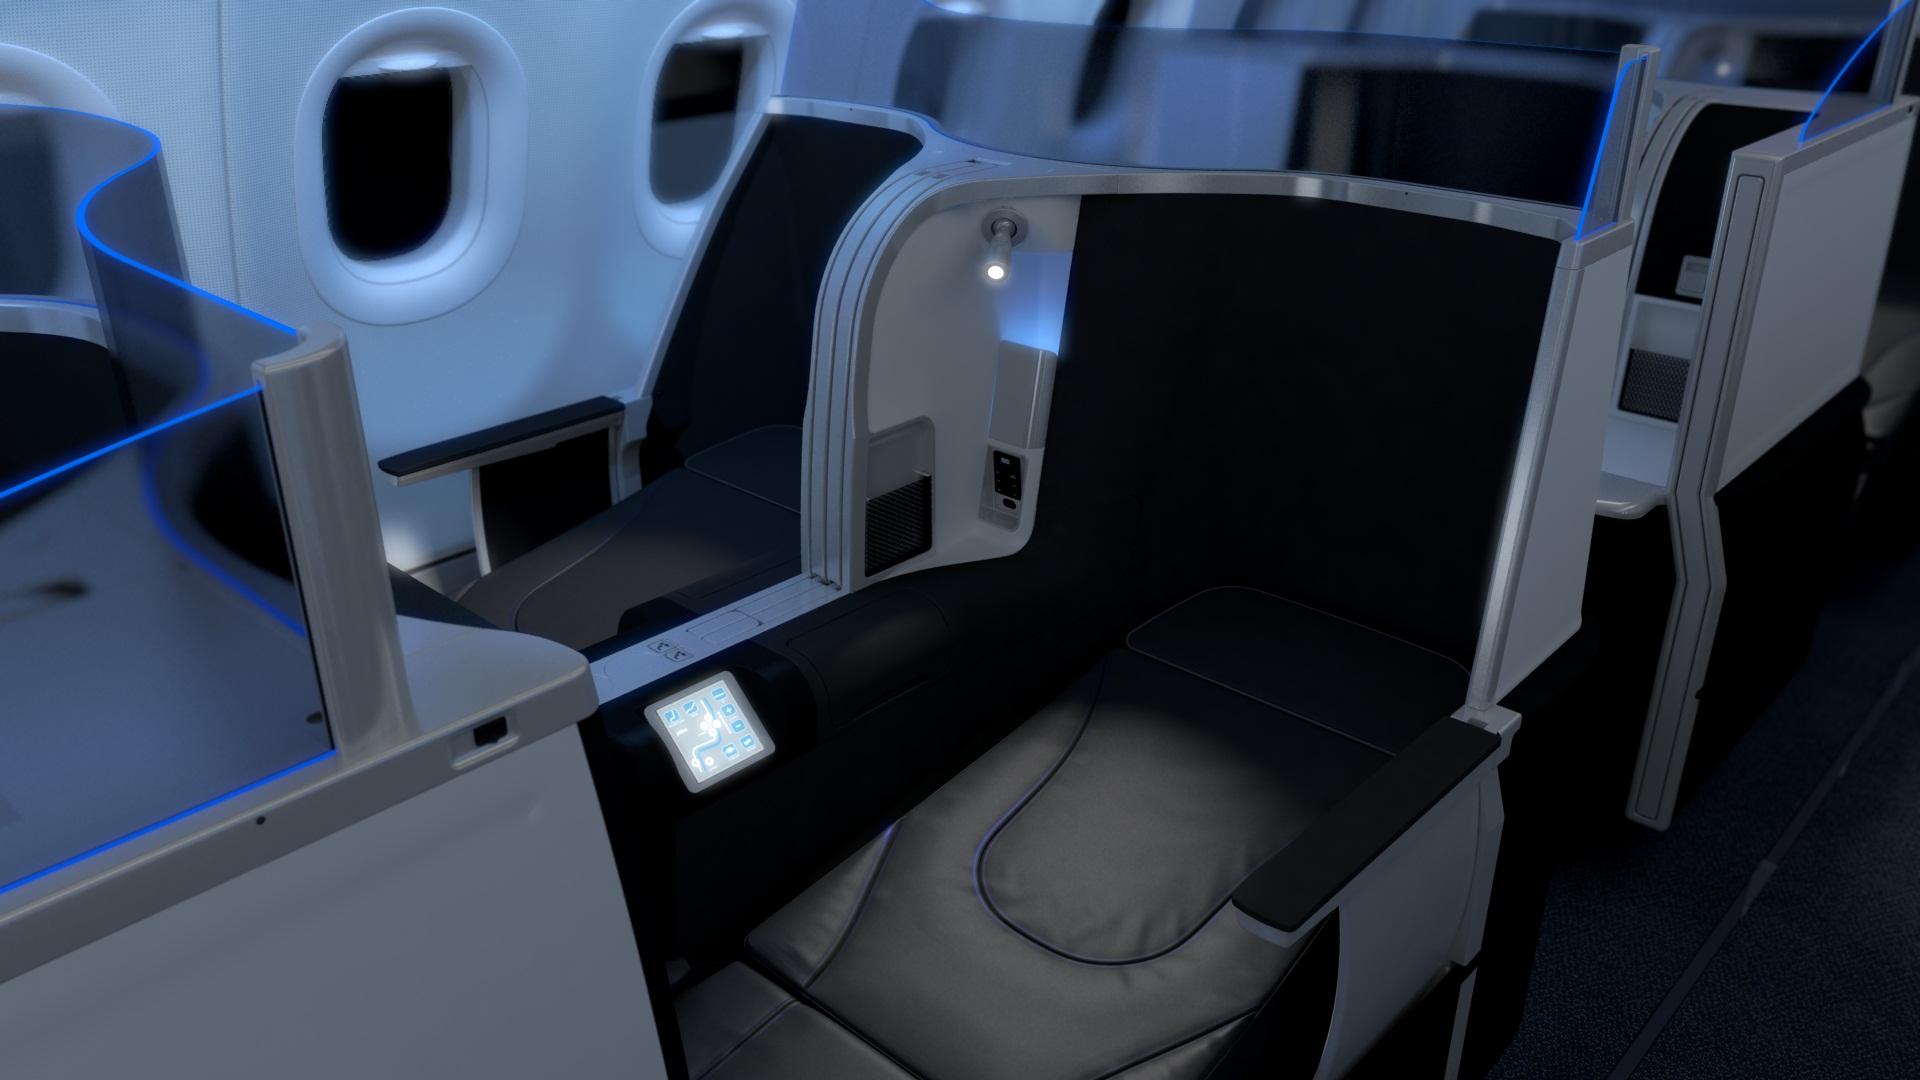 JetBlue's lie-flat seat.